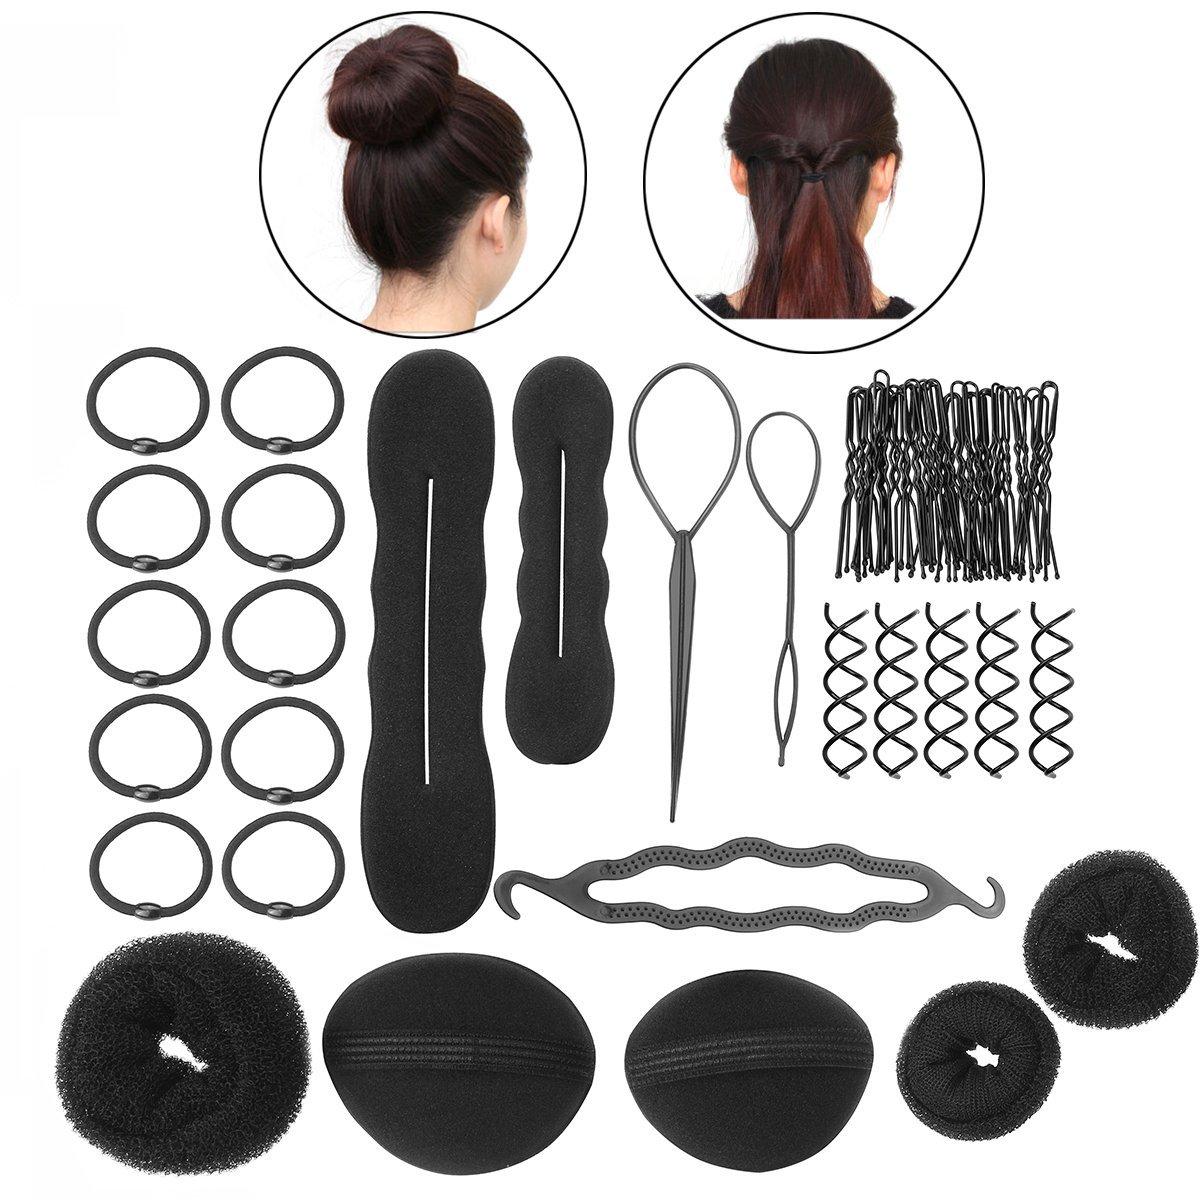 PIXNOR BRICOLAJE accesorios de peinado herramientas Kit Set para mujeres New